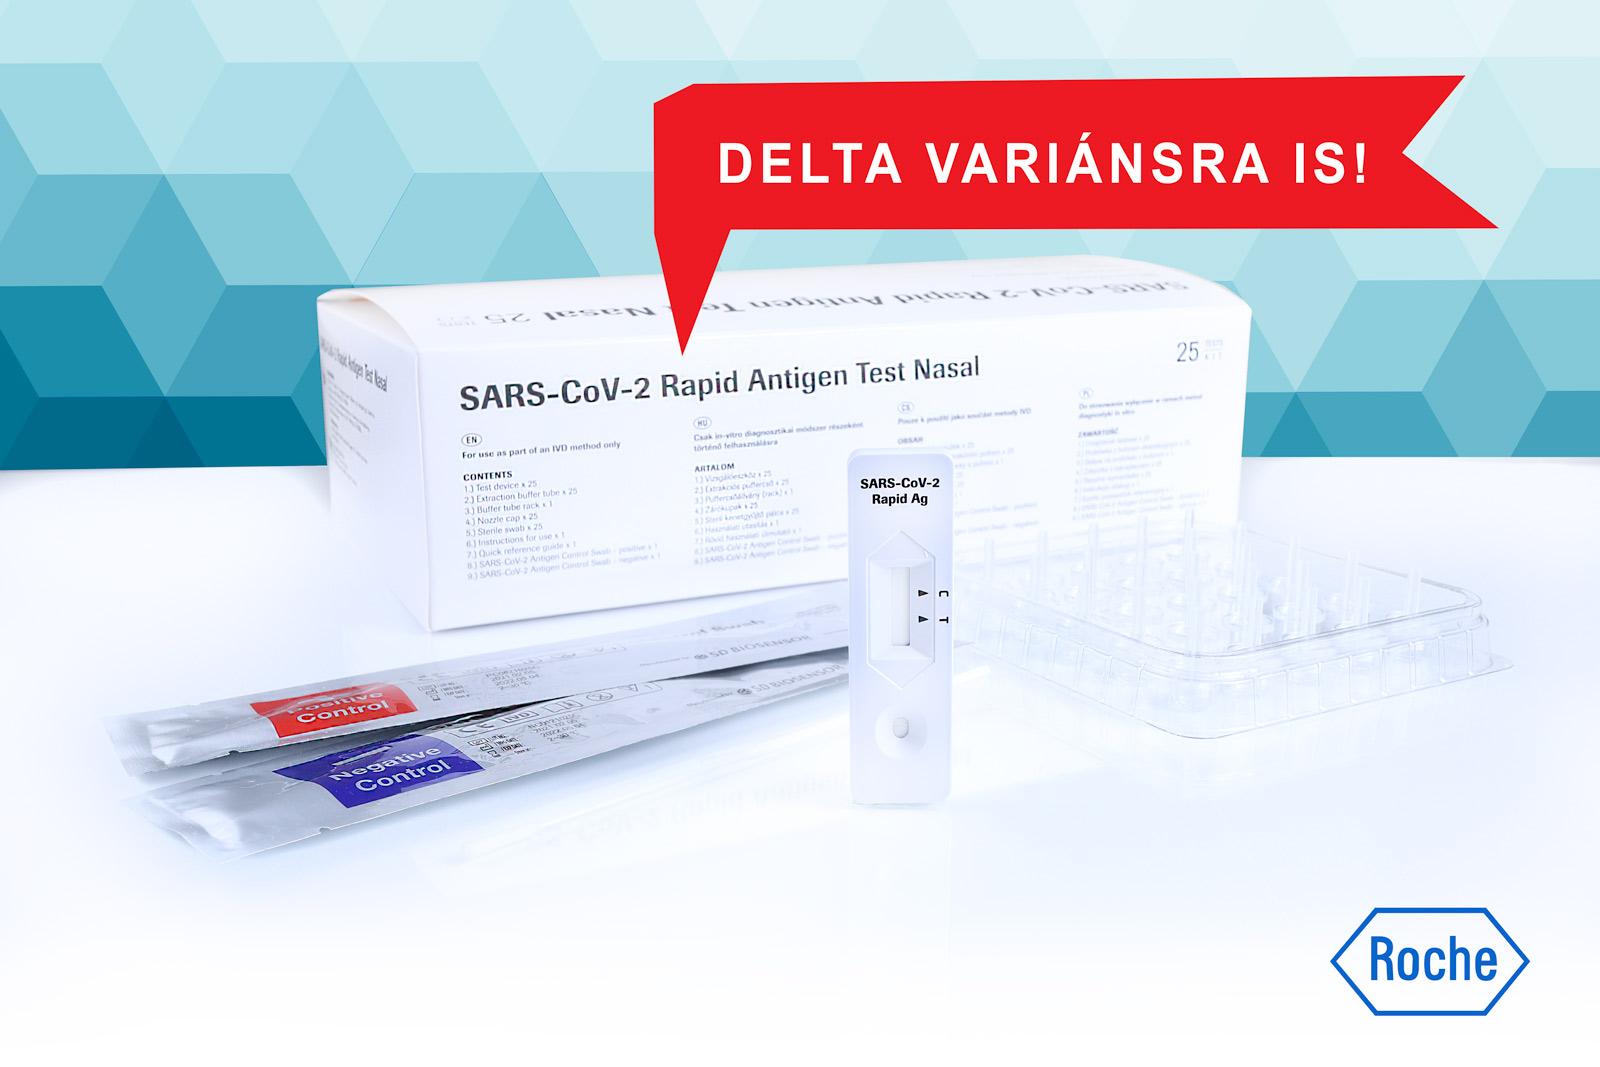 ROCHE SARS-CoV-2 Rapid Antigen Test Nasal Delta variáns tesztelésre is!